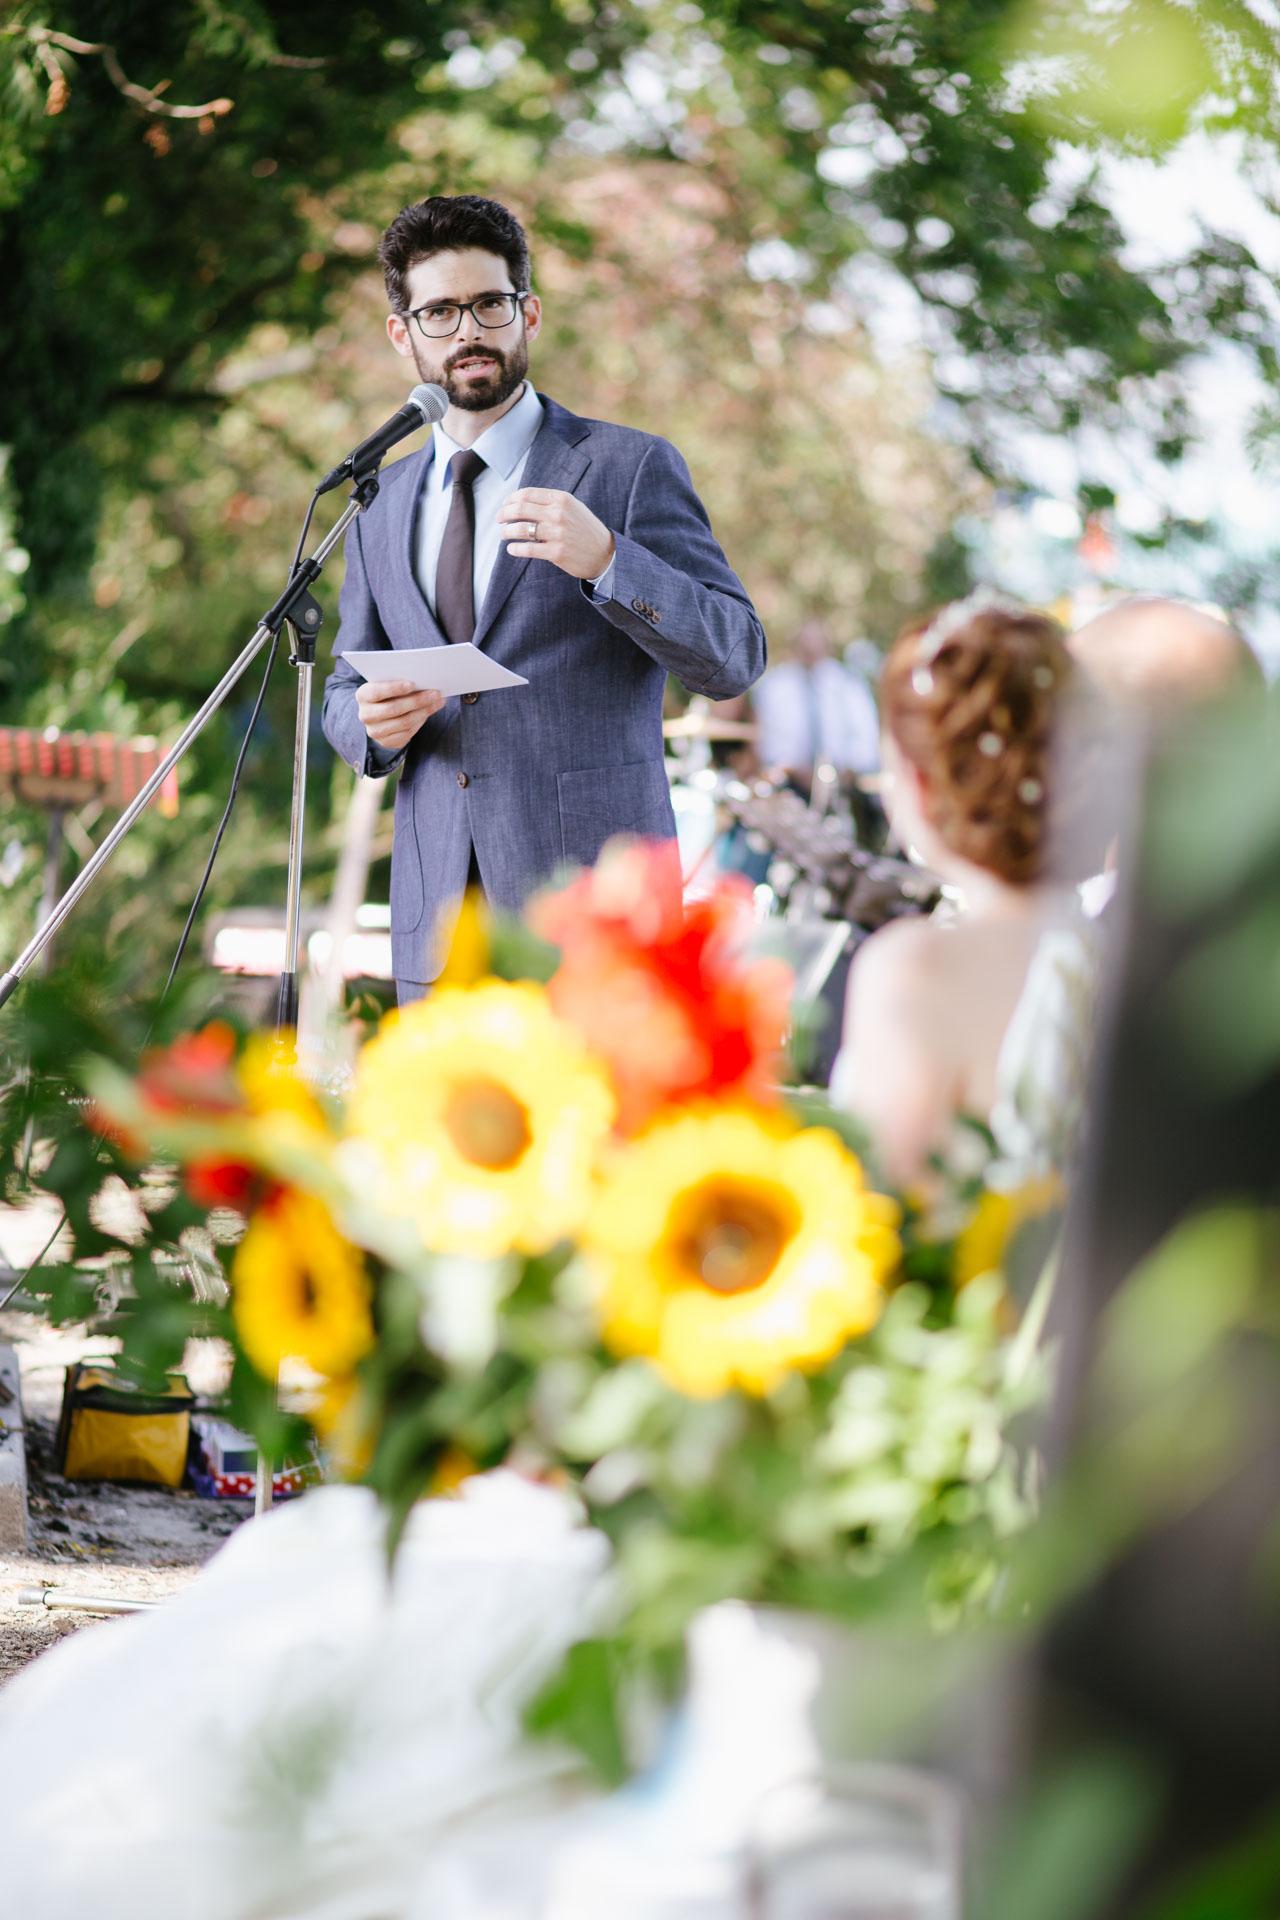 Pixelart_Hochzeitsfotografen_Loerrach_Rheinfelden_Hallwil_Schweiz_Linda-Ramon-1032